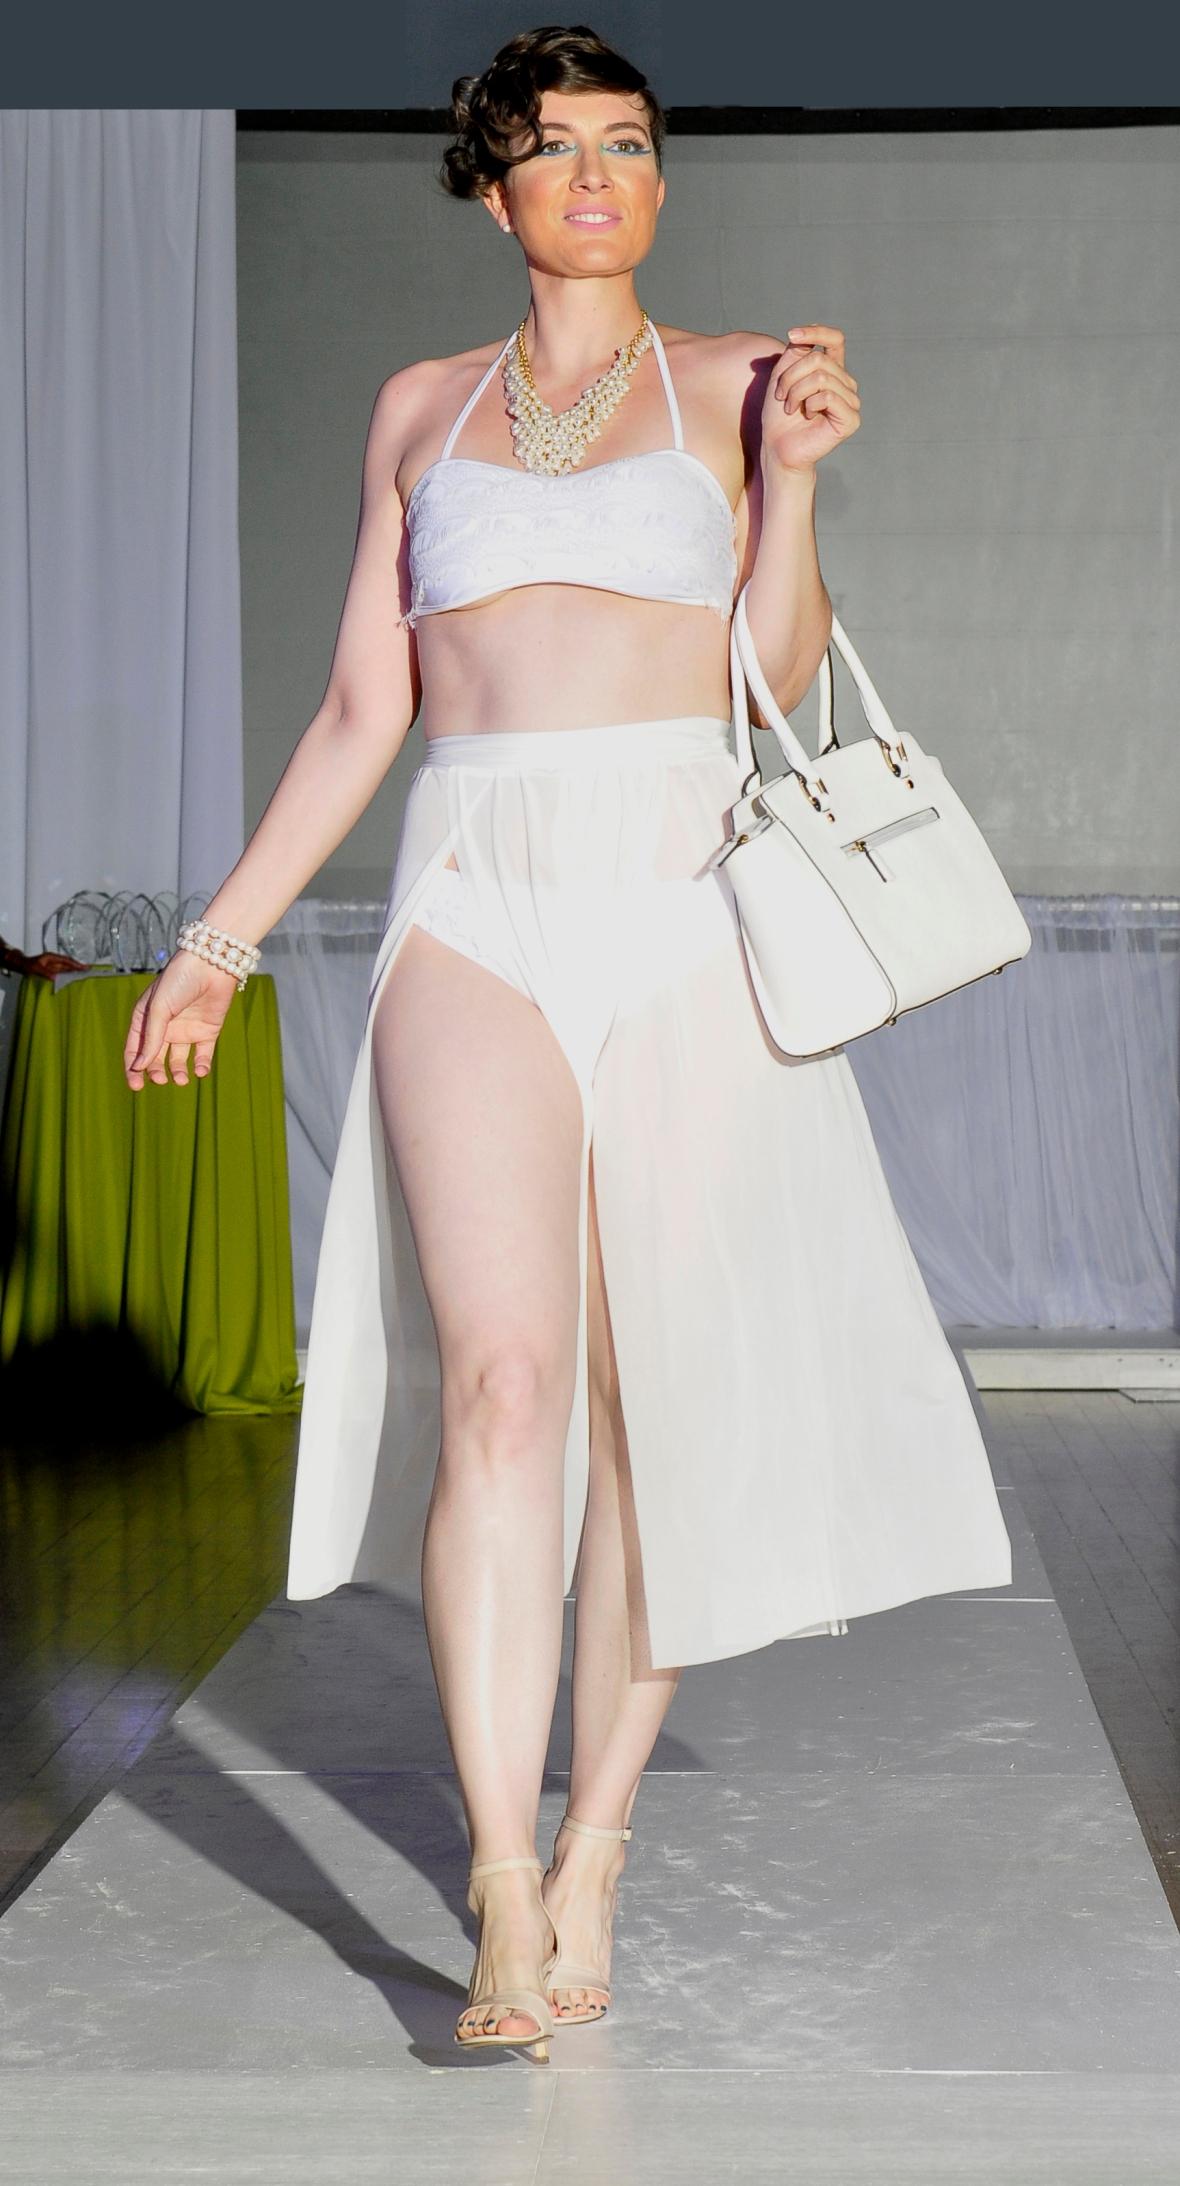 CSC i-Fashion SteveB 1